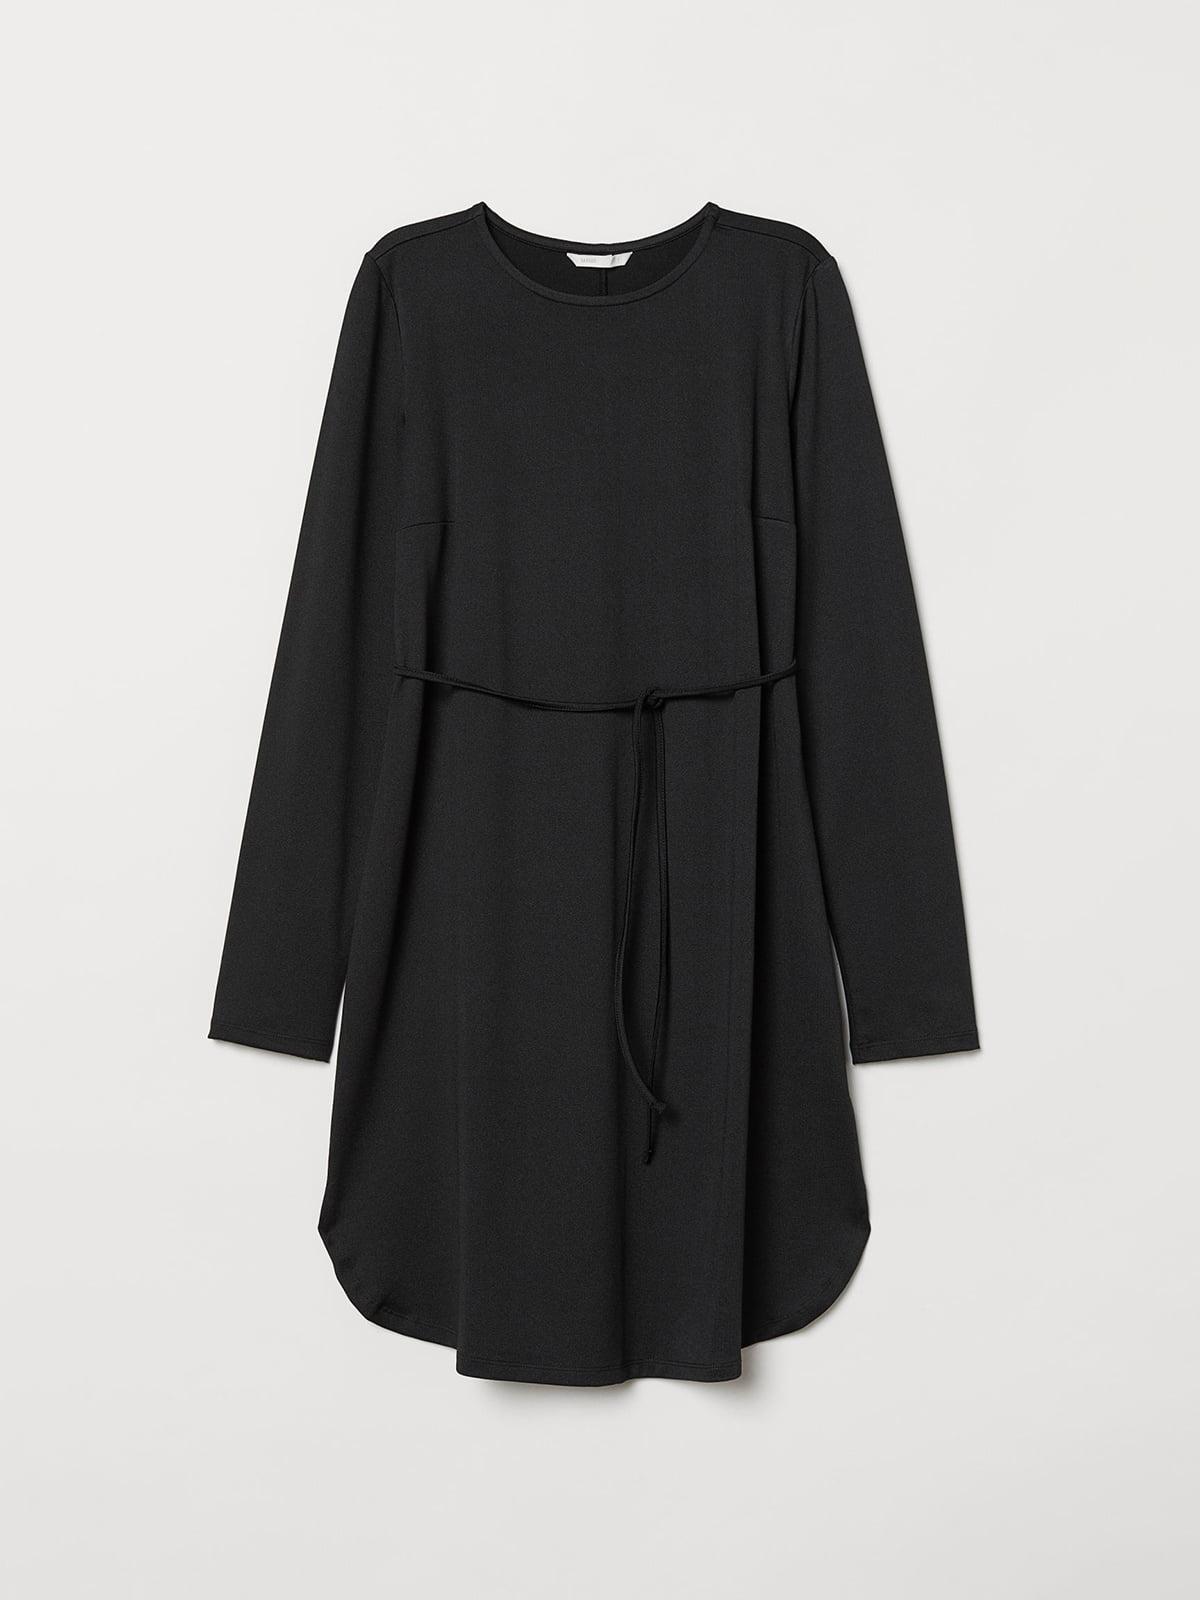 Сукня чорна   5485179